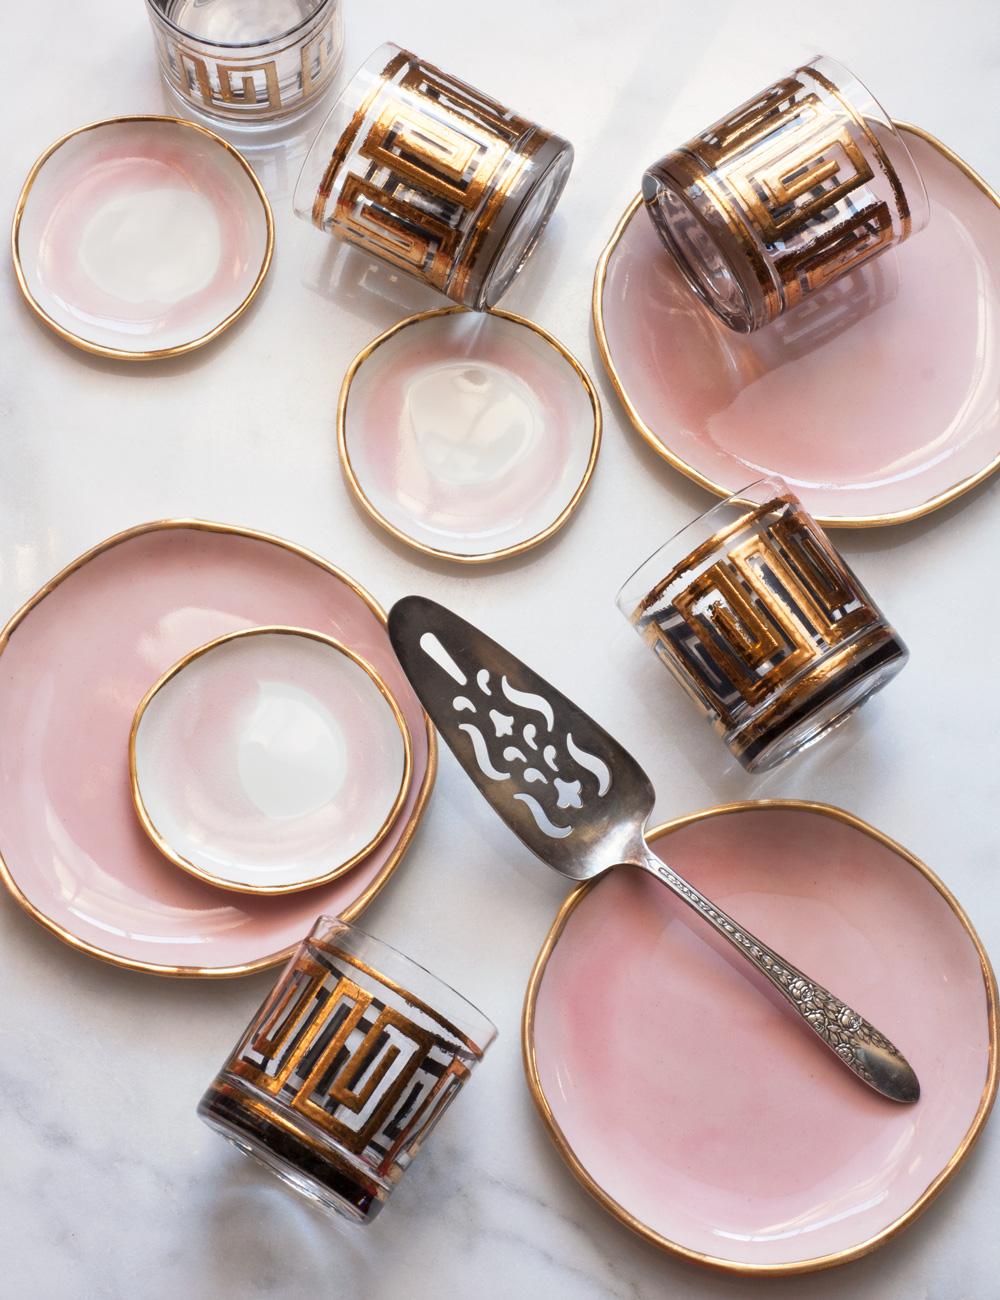 suite-one-studio-rose-dessert-plates-with-gold-rim-vintage-glasses-greek-key-and-silver-server.jpg